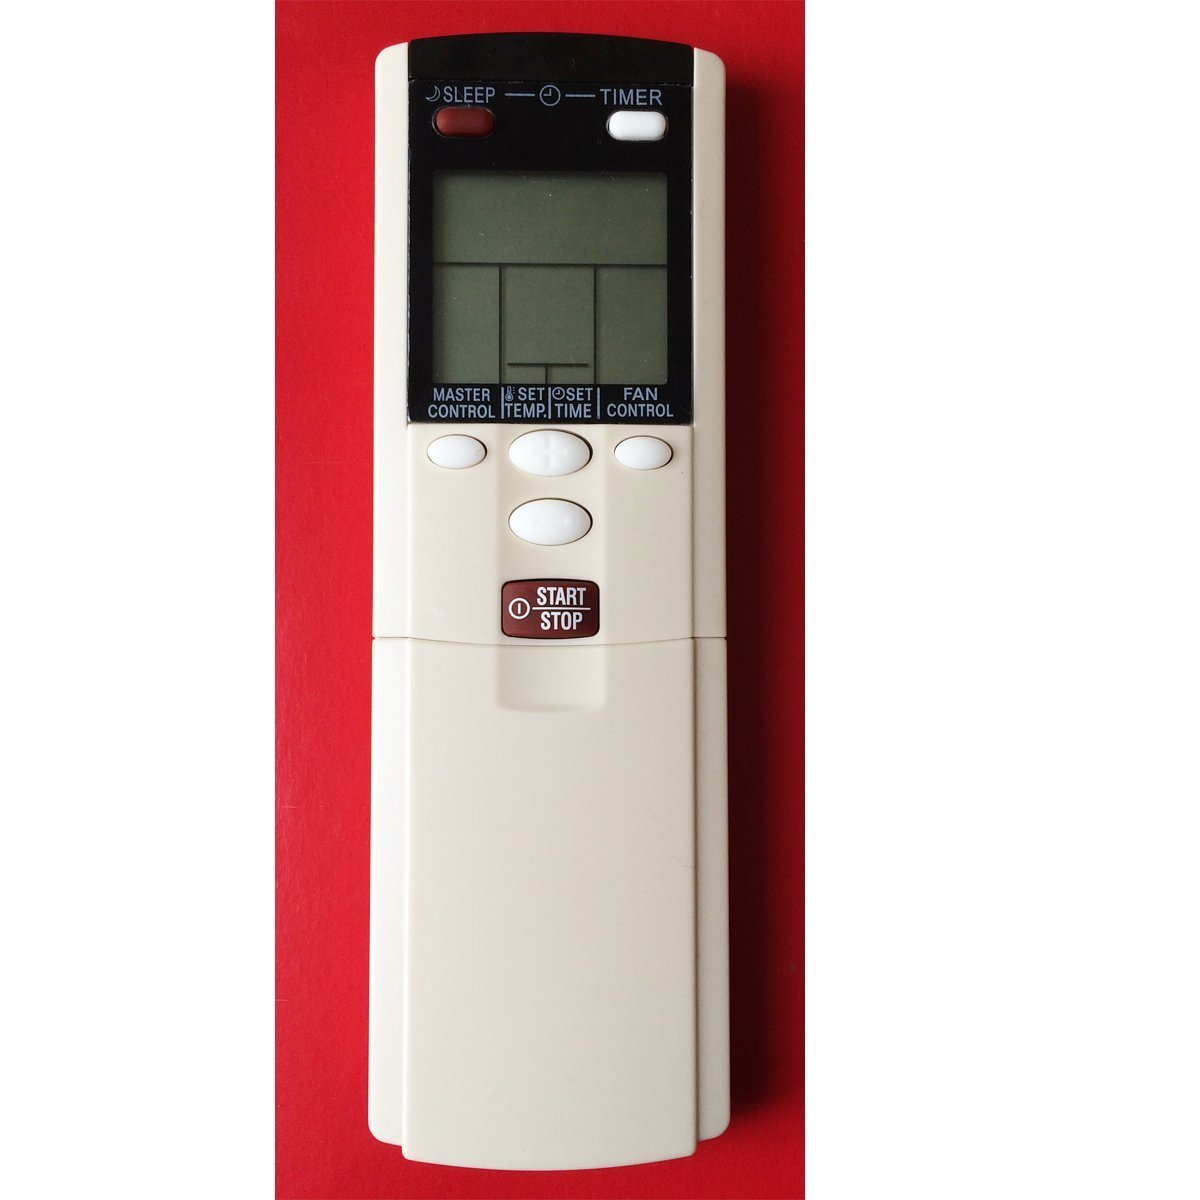 Generic Replacement Air Conditioner Remote Control for Fujitsu GENERAL AR-DL3 AR-DL1 AR-DL2 AR-DL4 AR-DL5 AR-DL6 AR-DL7 AR-DL8 AR-DL9 AR-DL10